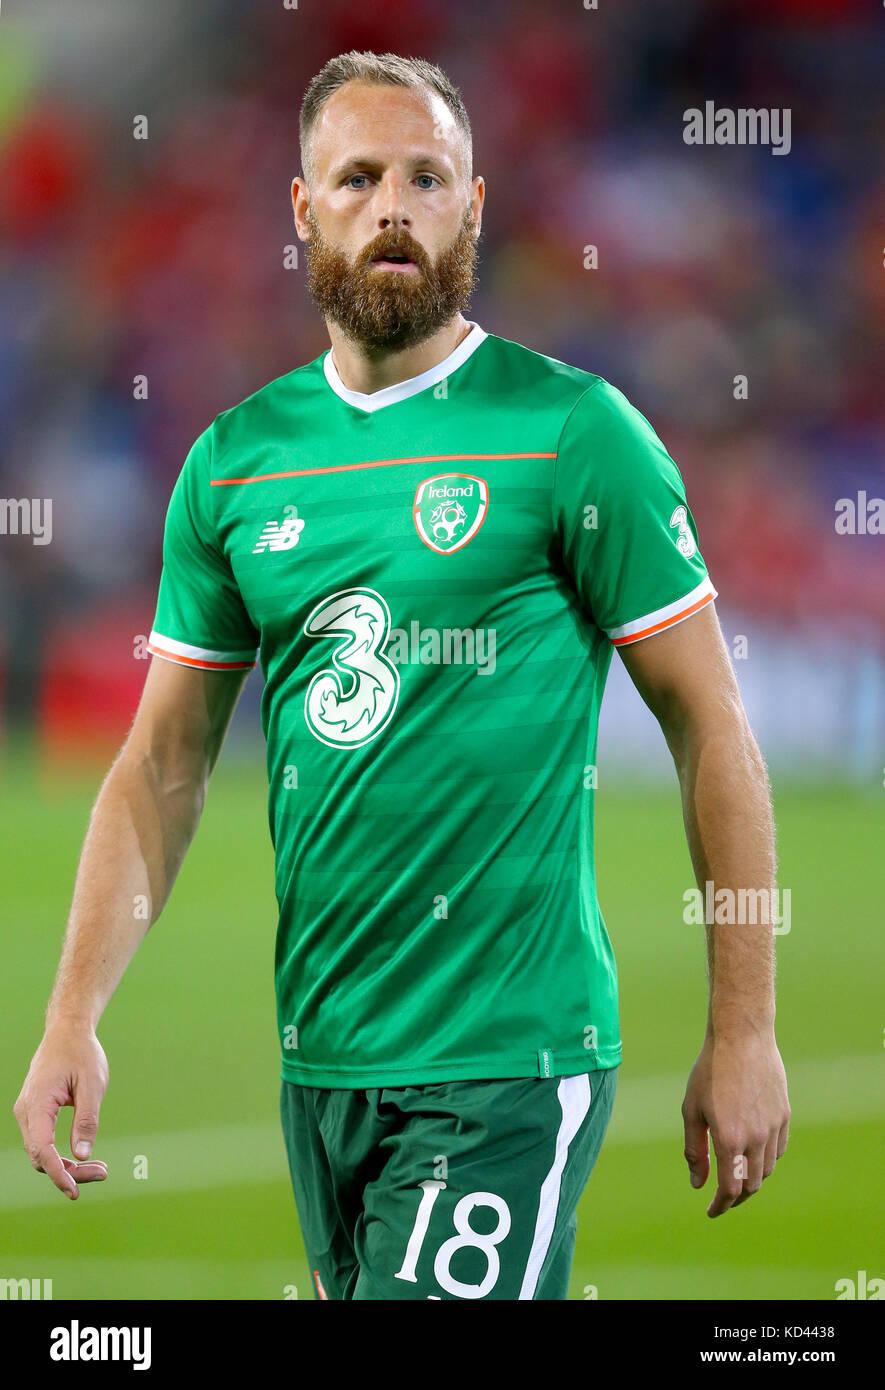 Republic Of Ireland S David Meyler Ahead The 2018 Fifa World Cup Qualifying Group D Match At Cardiff City Stadium Press Association Photo